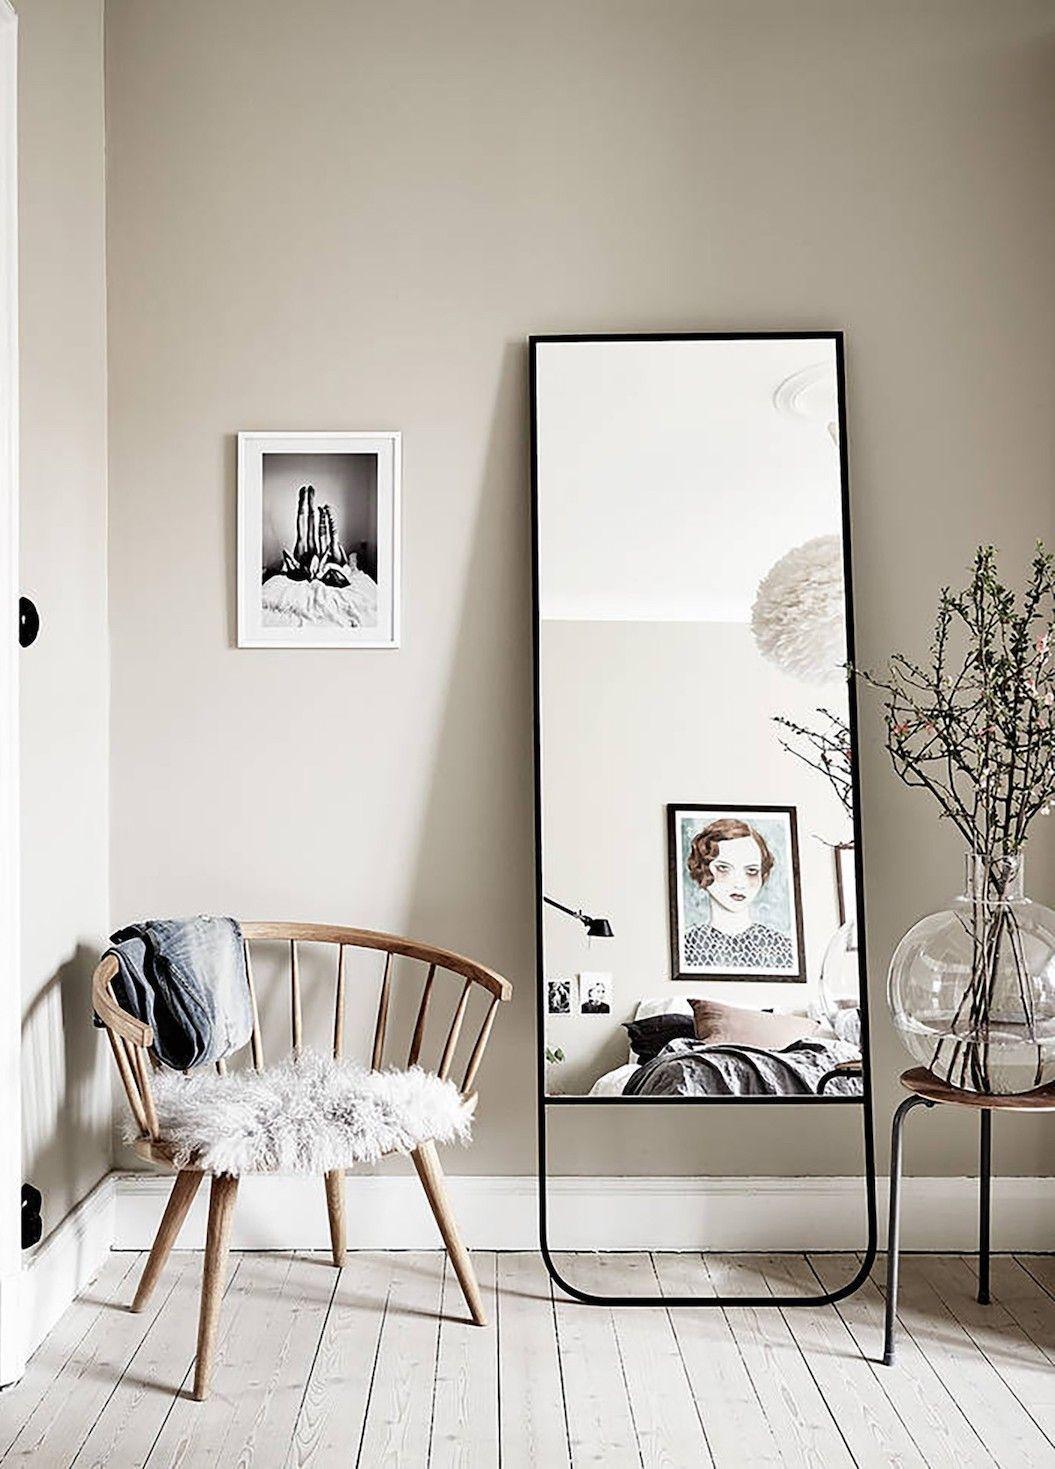 11 Scandinavian Mirrors For A Nordic Look In 2020 White Dining Room Decor Home Decor Scandinavian Interior Design